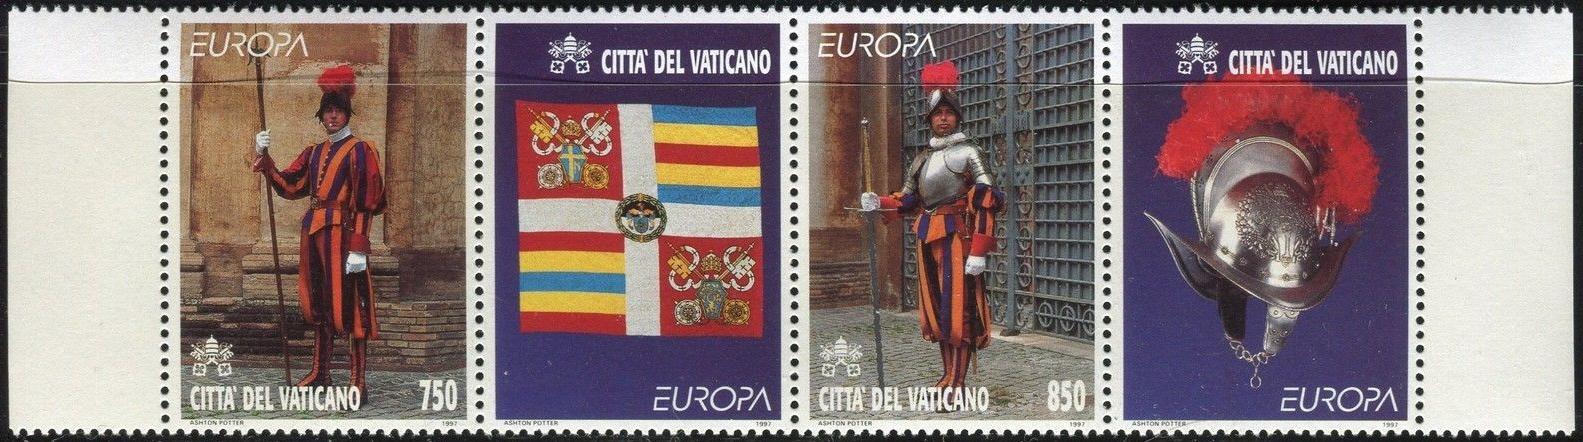 Vatican City - Scott #1039a (1997) strip of 2 stamps + 2 labels